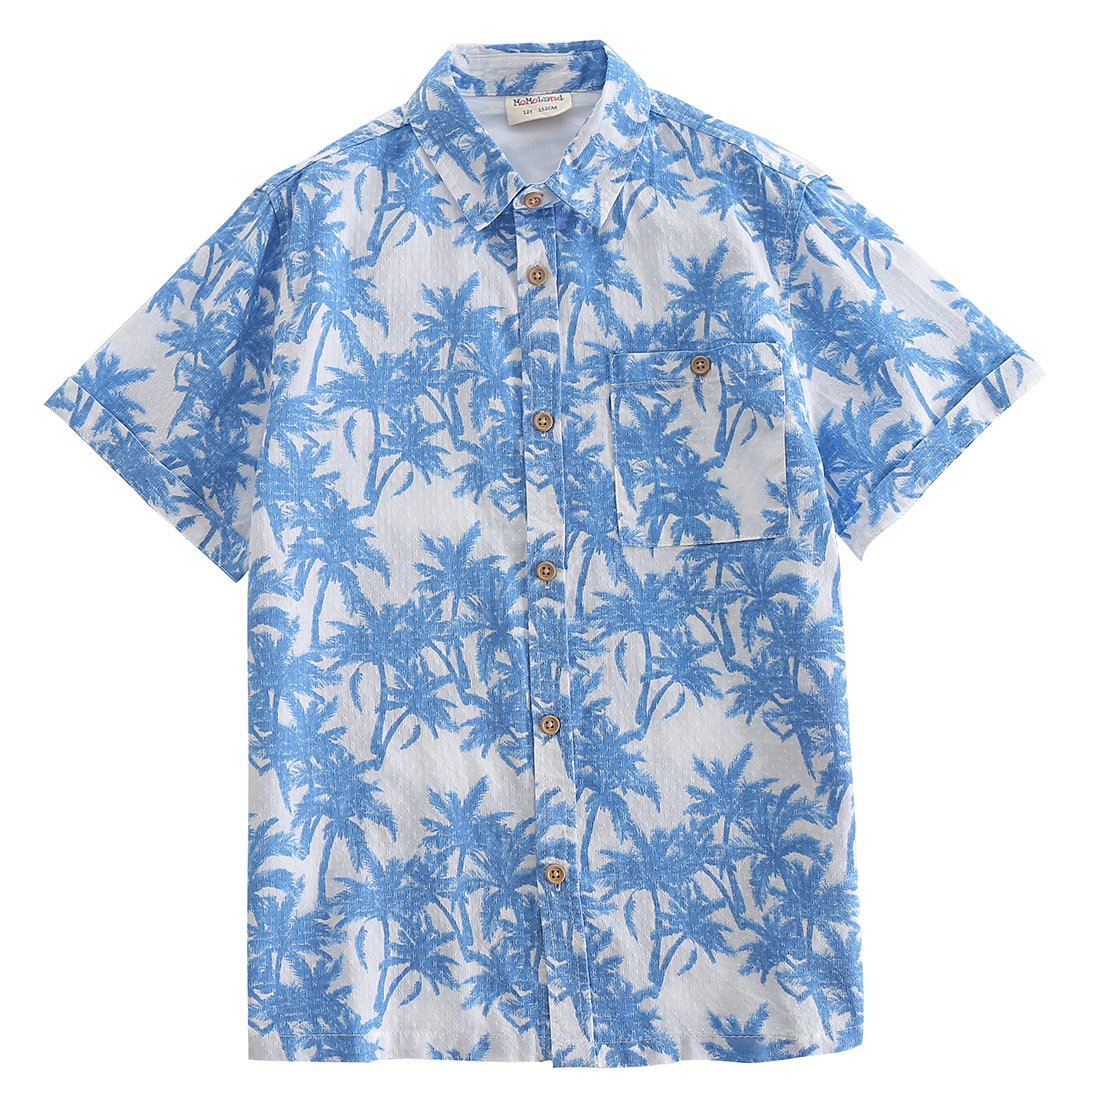 MOMOLAND Big Boys' Short Sleeve Woven Print Button Down Shirt Blue